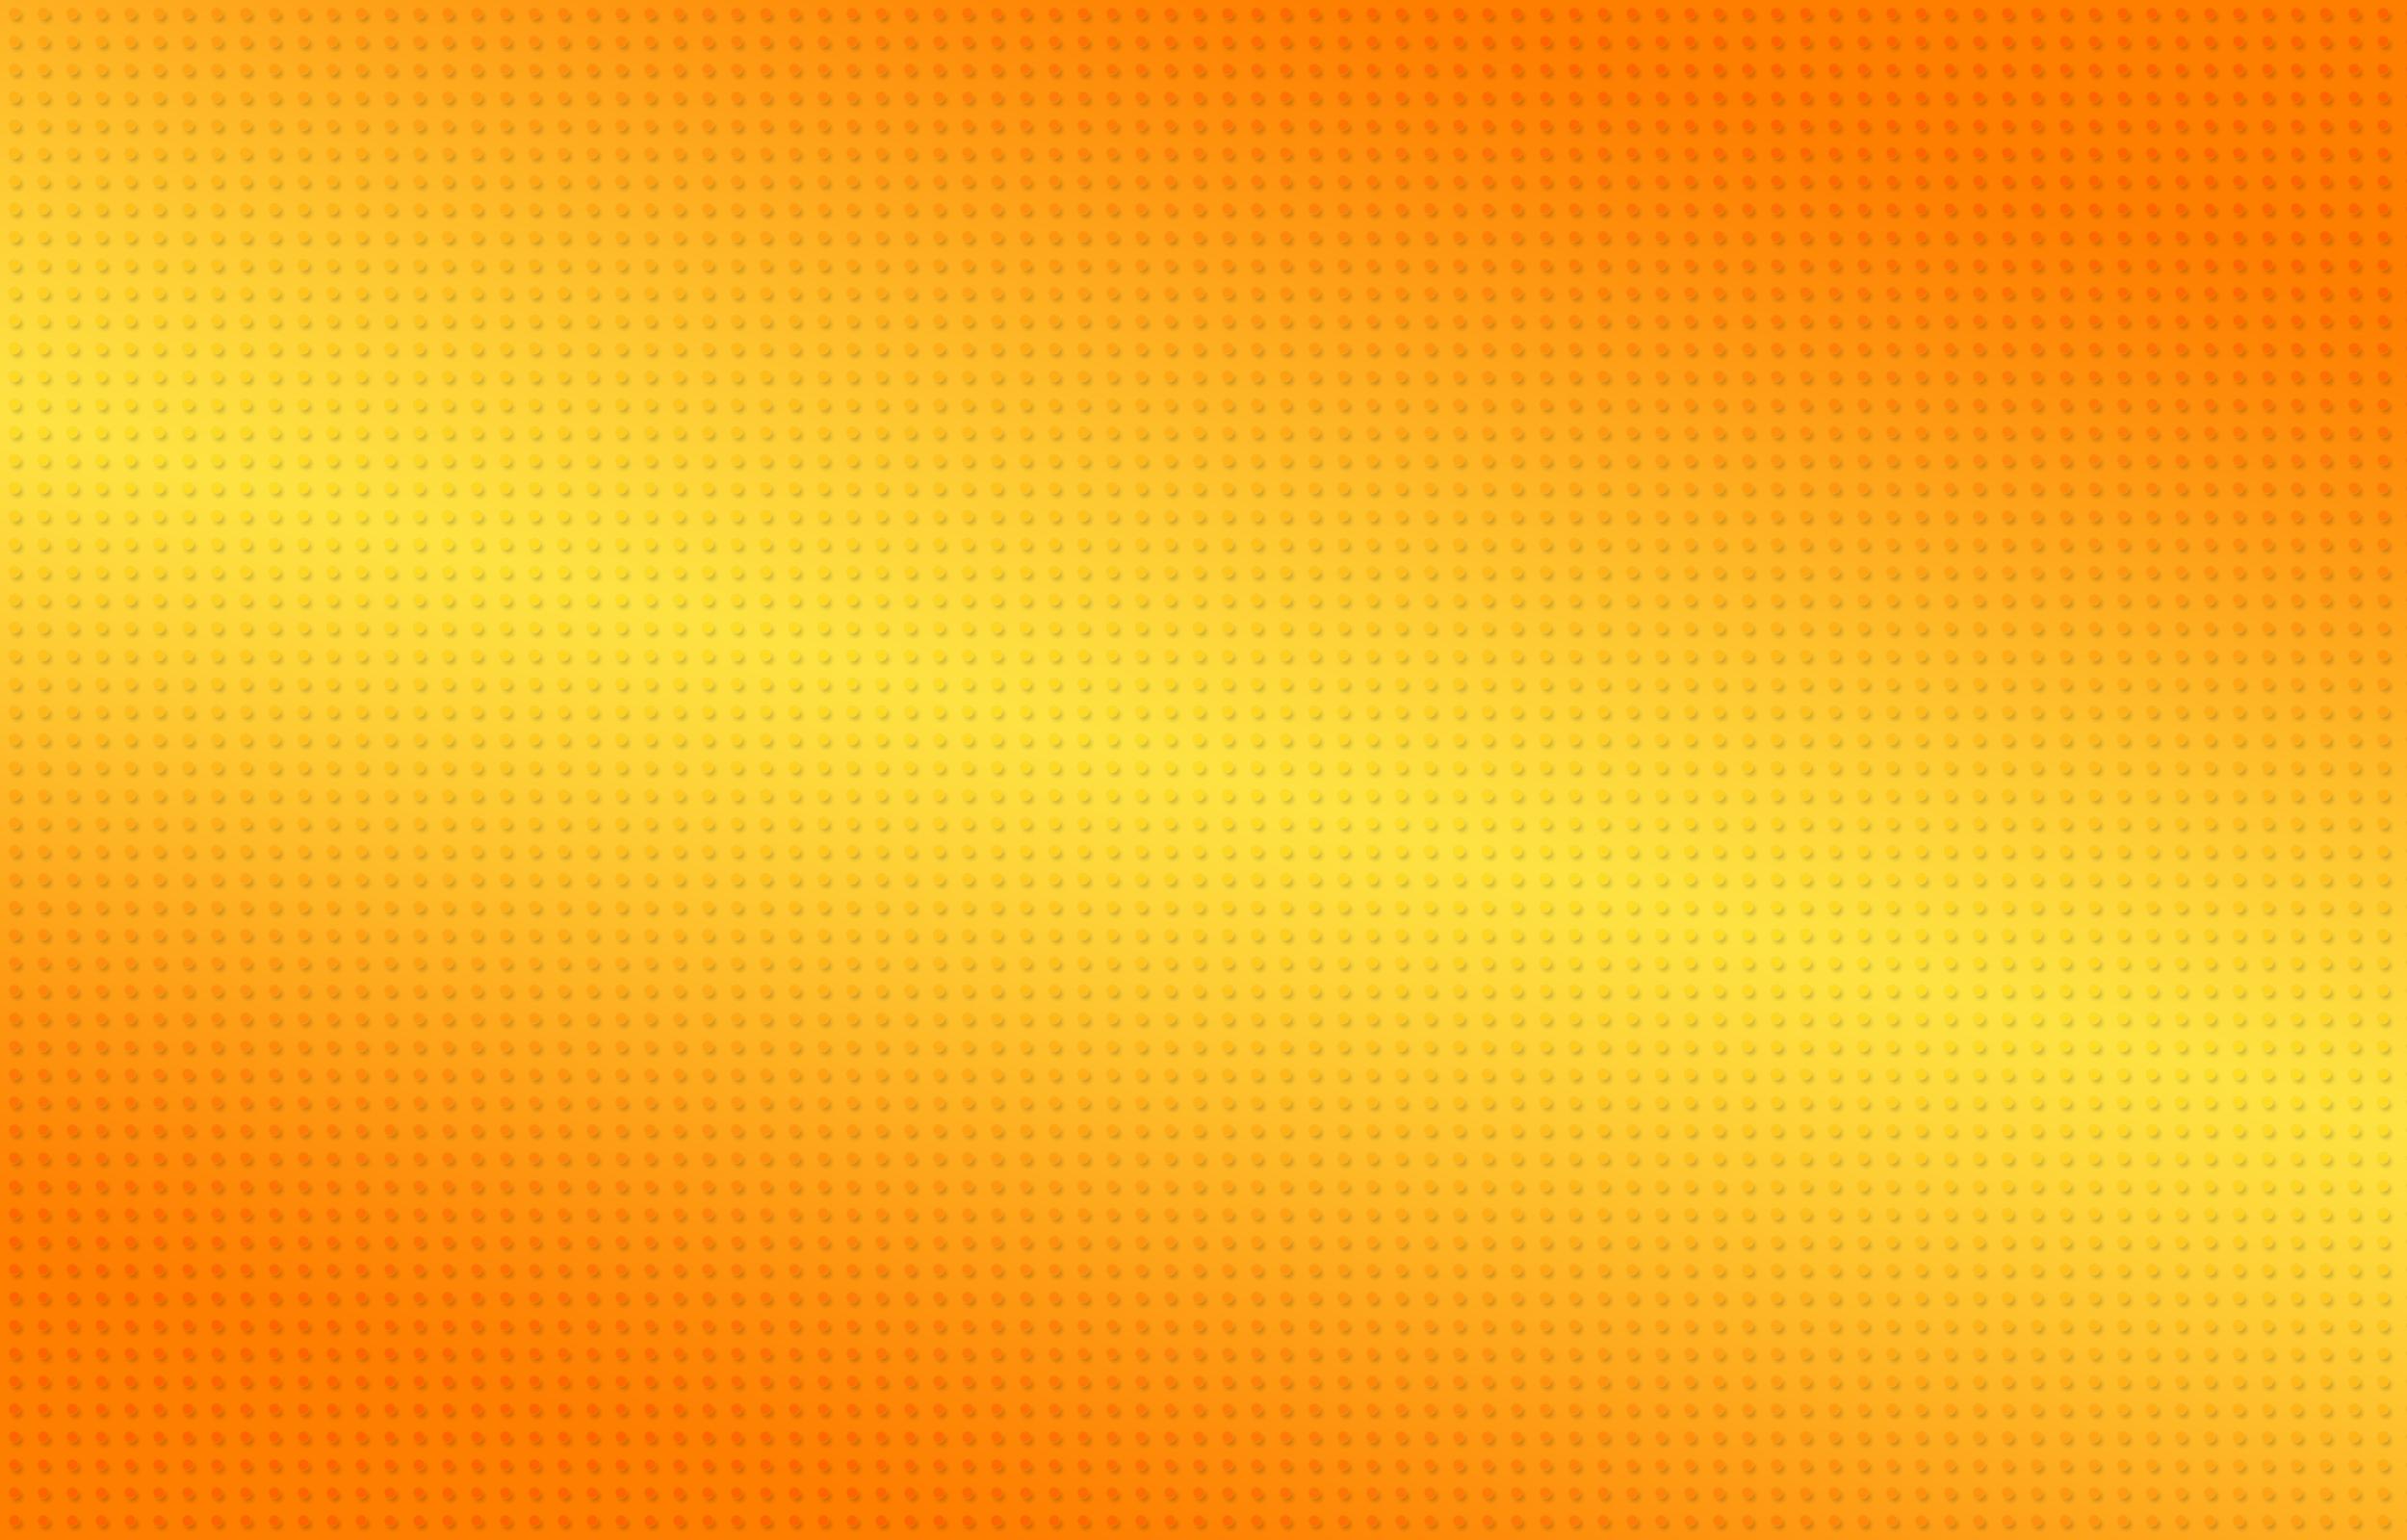 Orange Orange Wallpaper 2500x1600